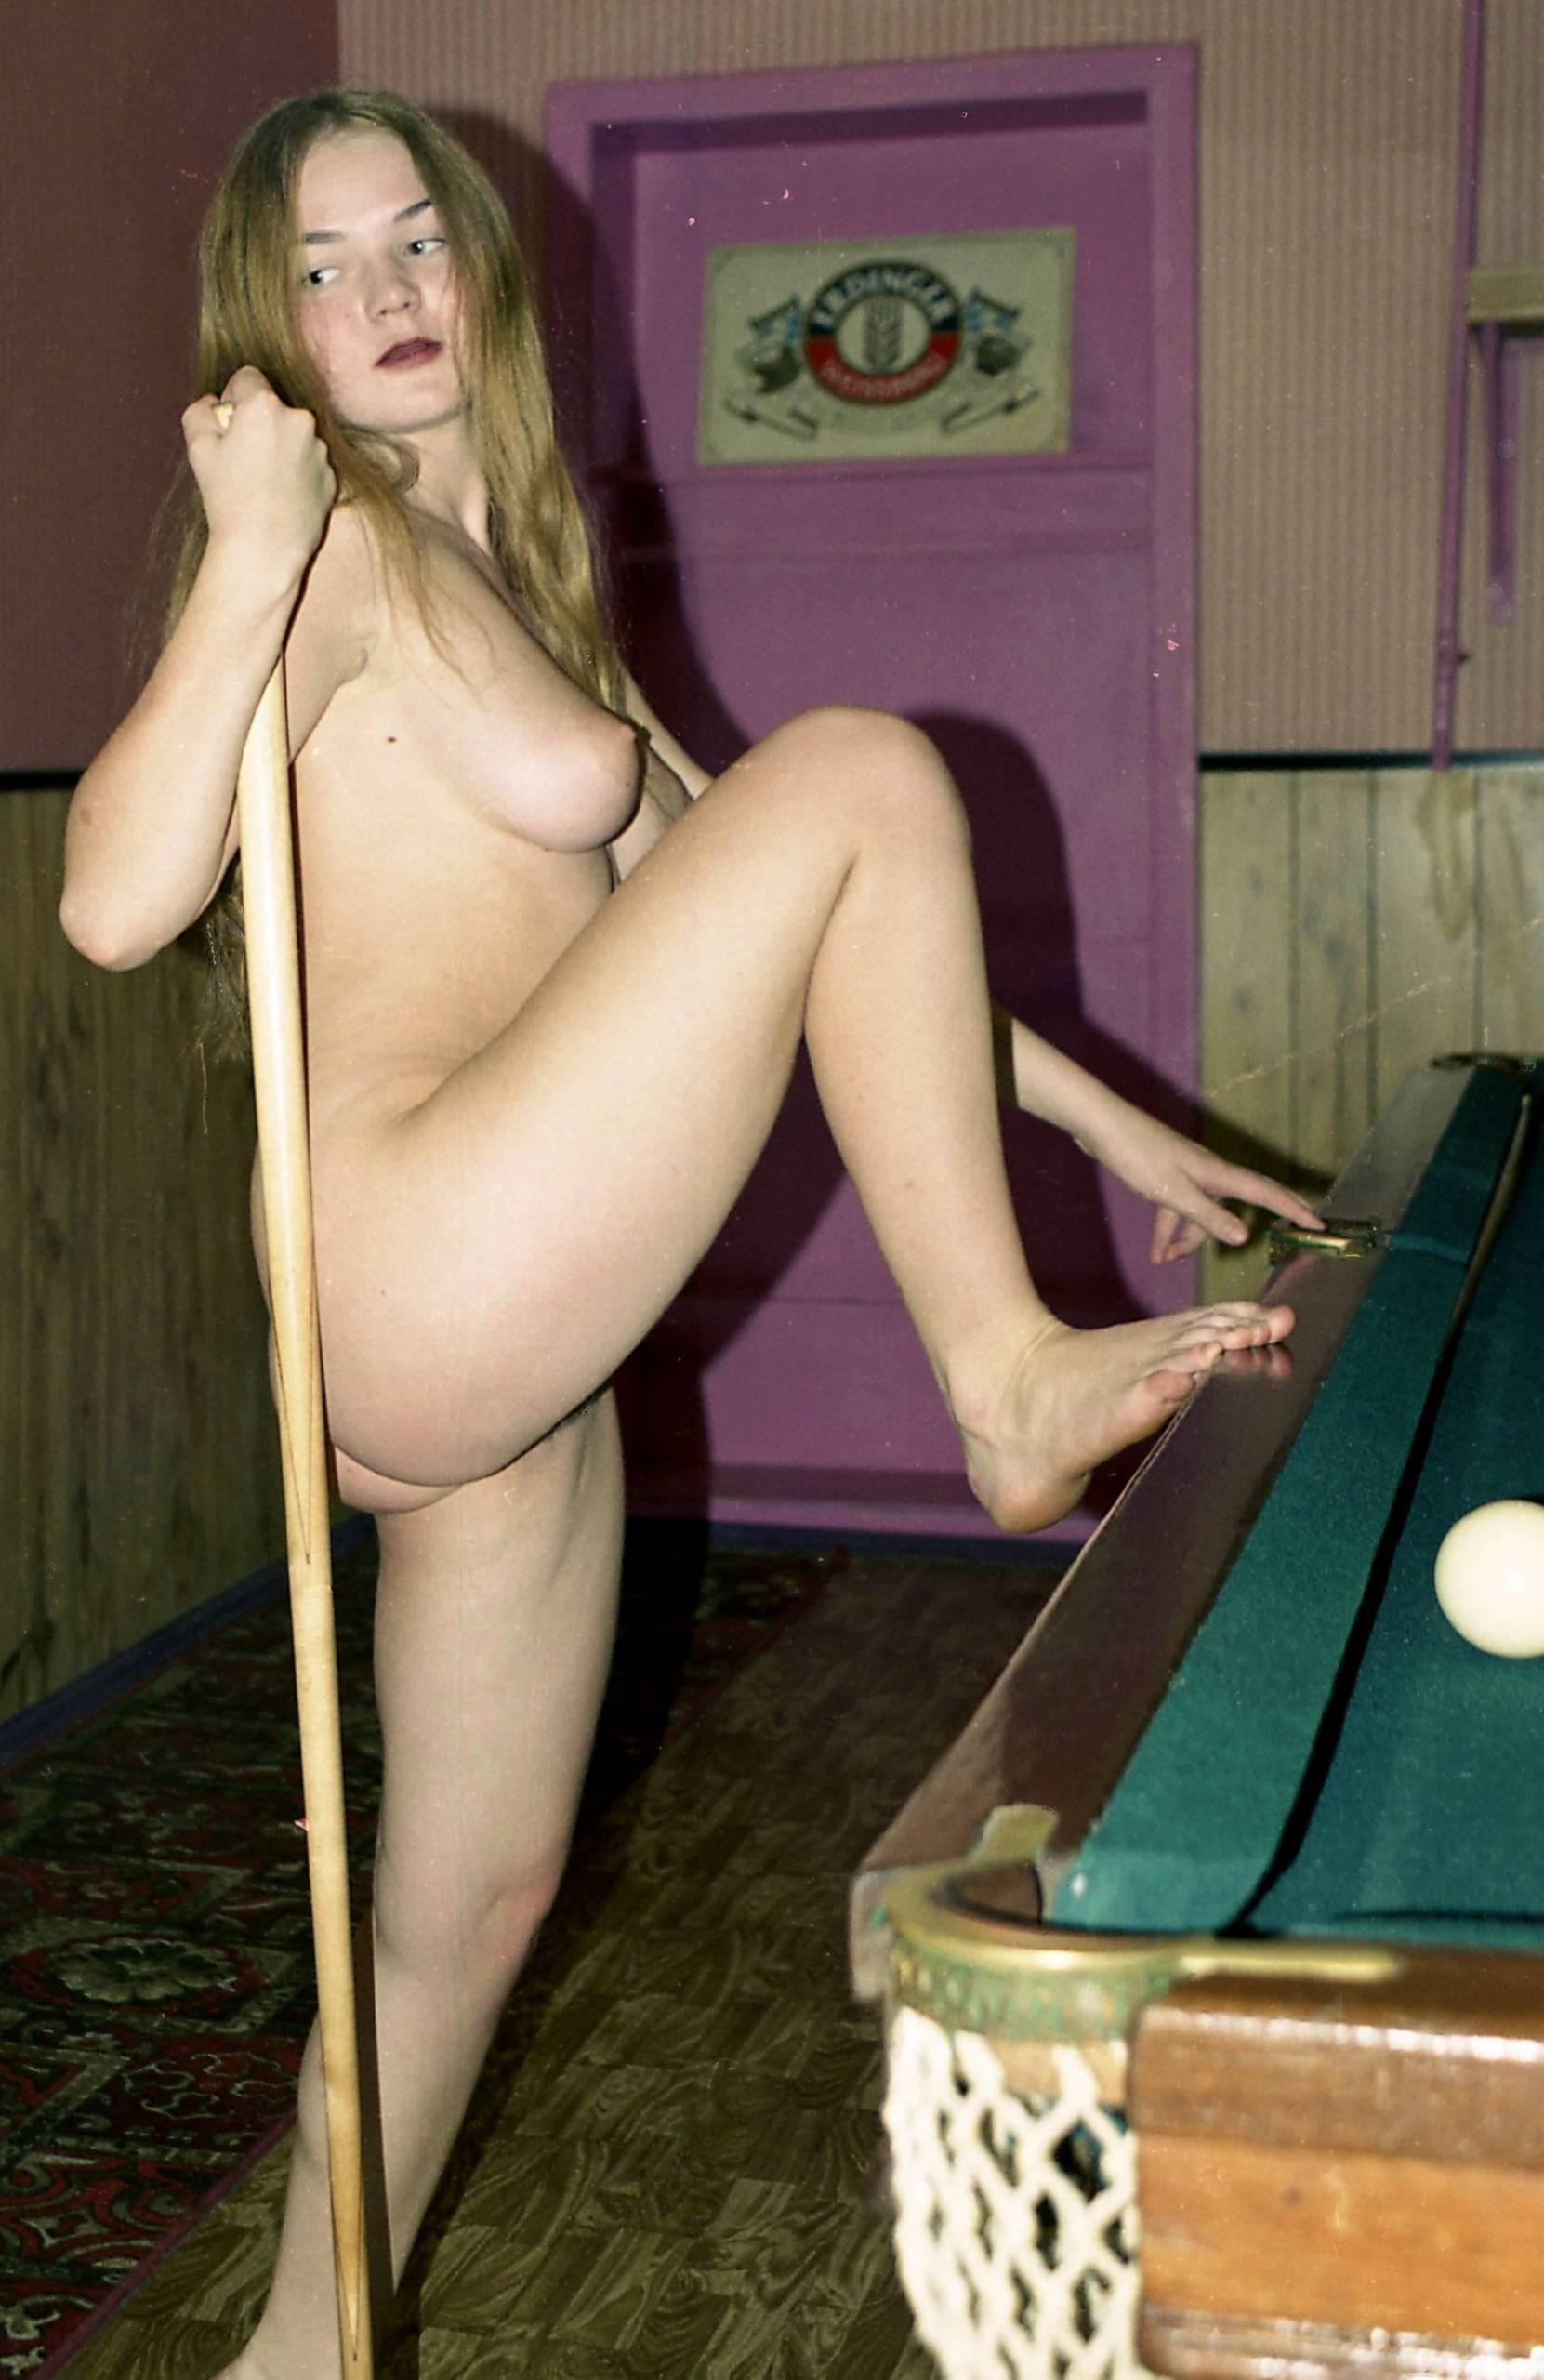 Pleasant Billiard Games - 2